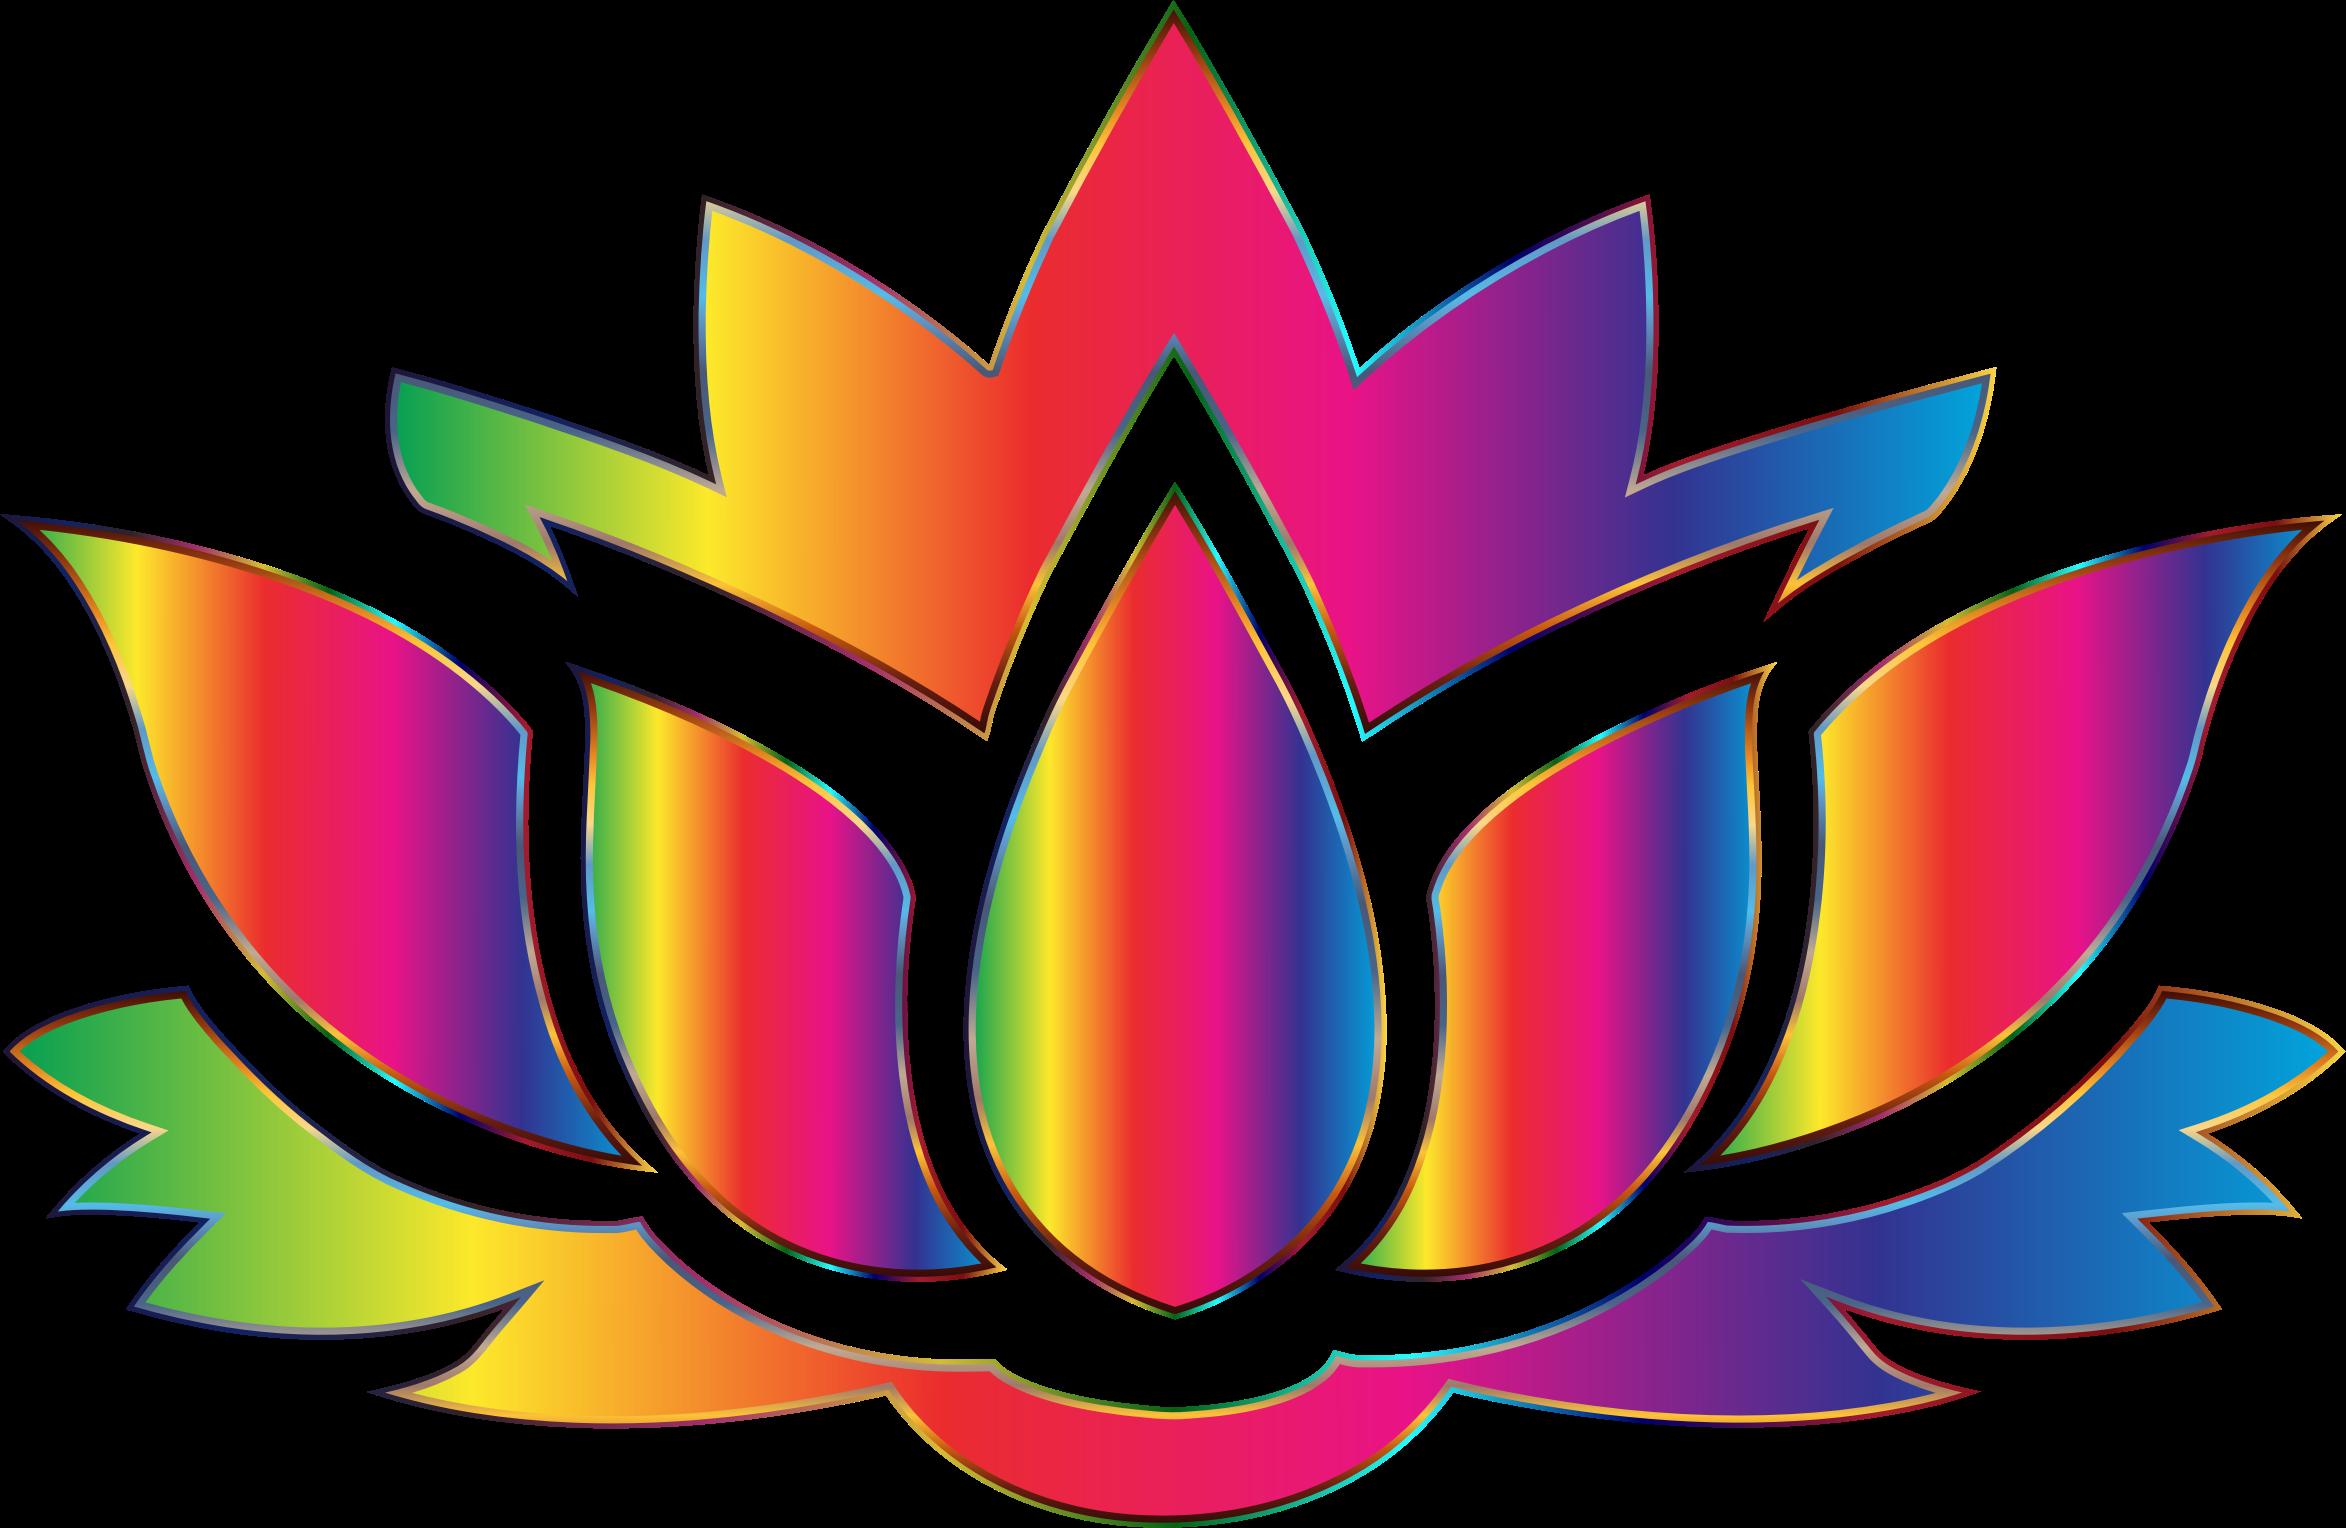 Rainbow Lotus Flower Silhouette No Background Flower